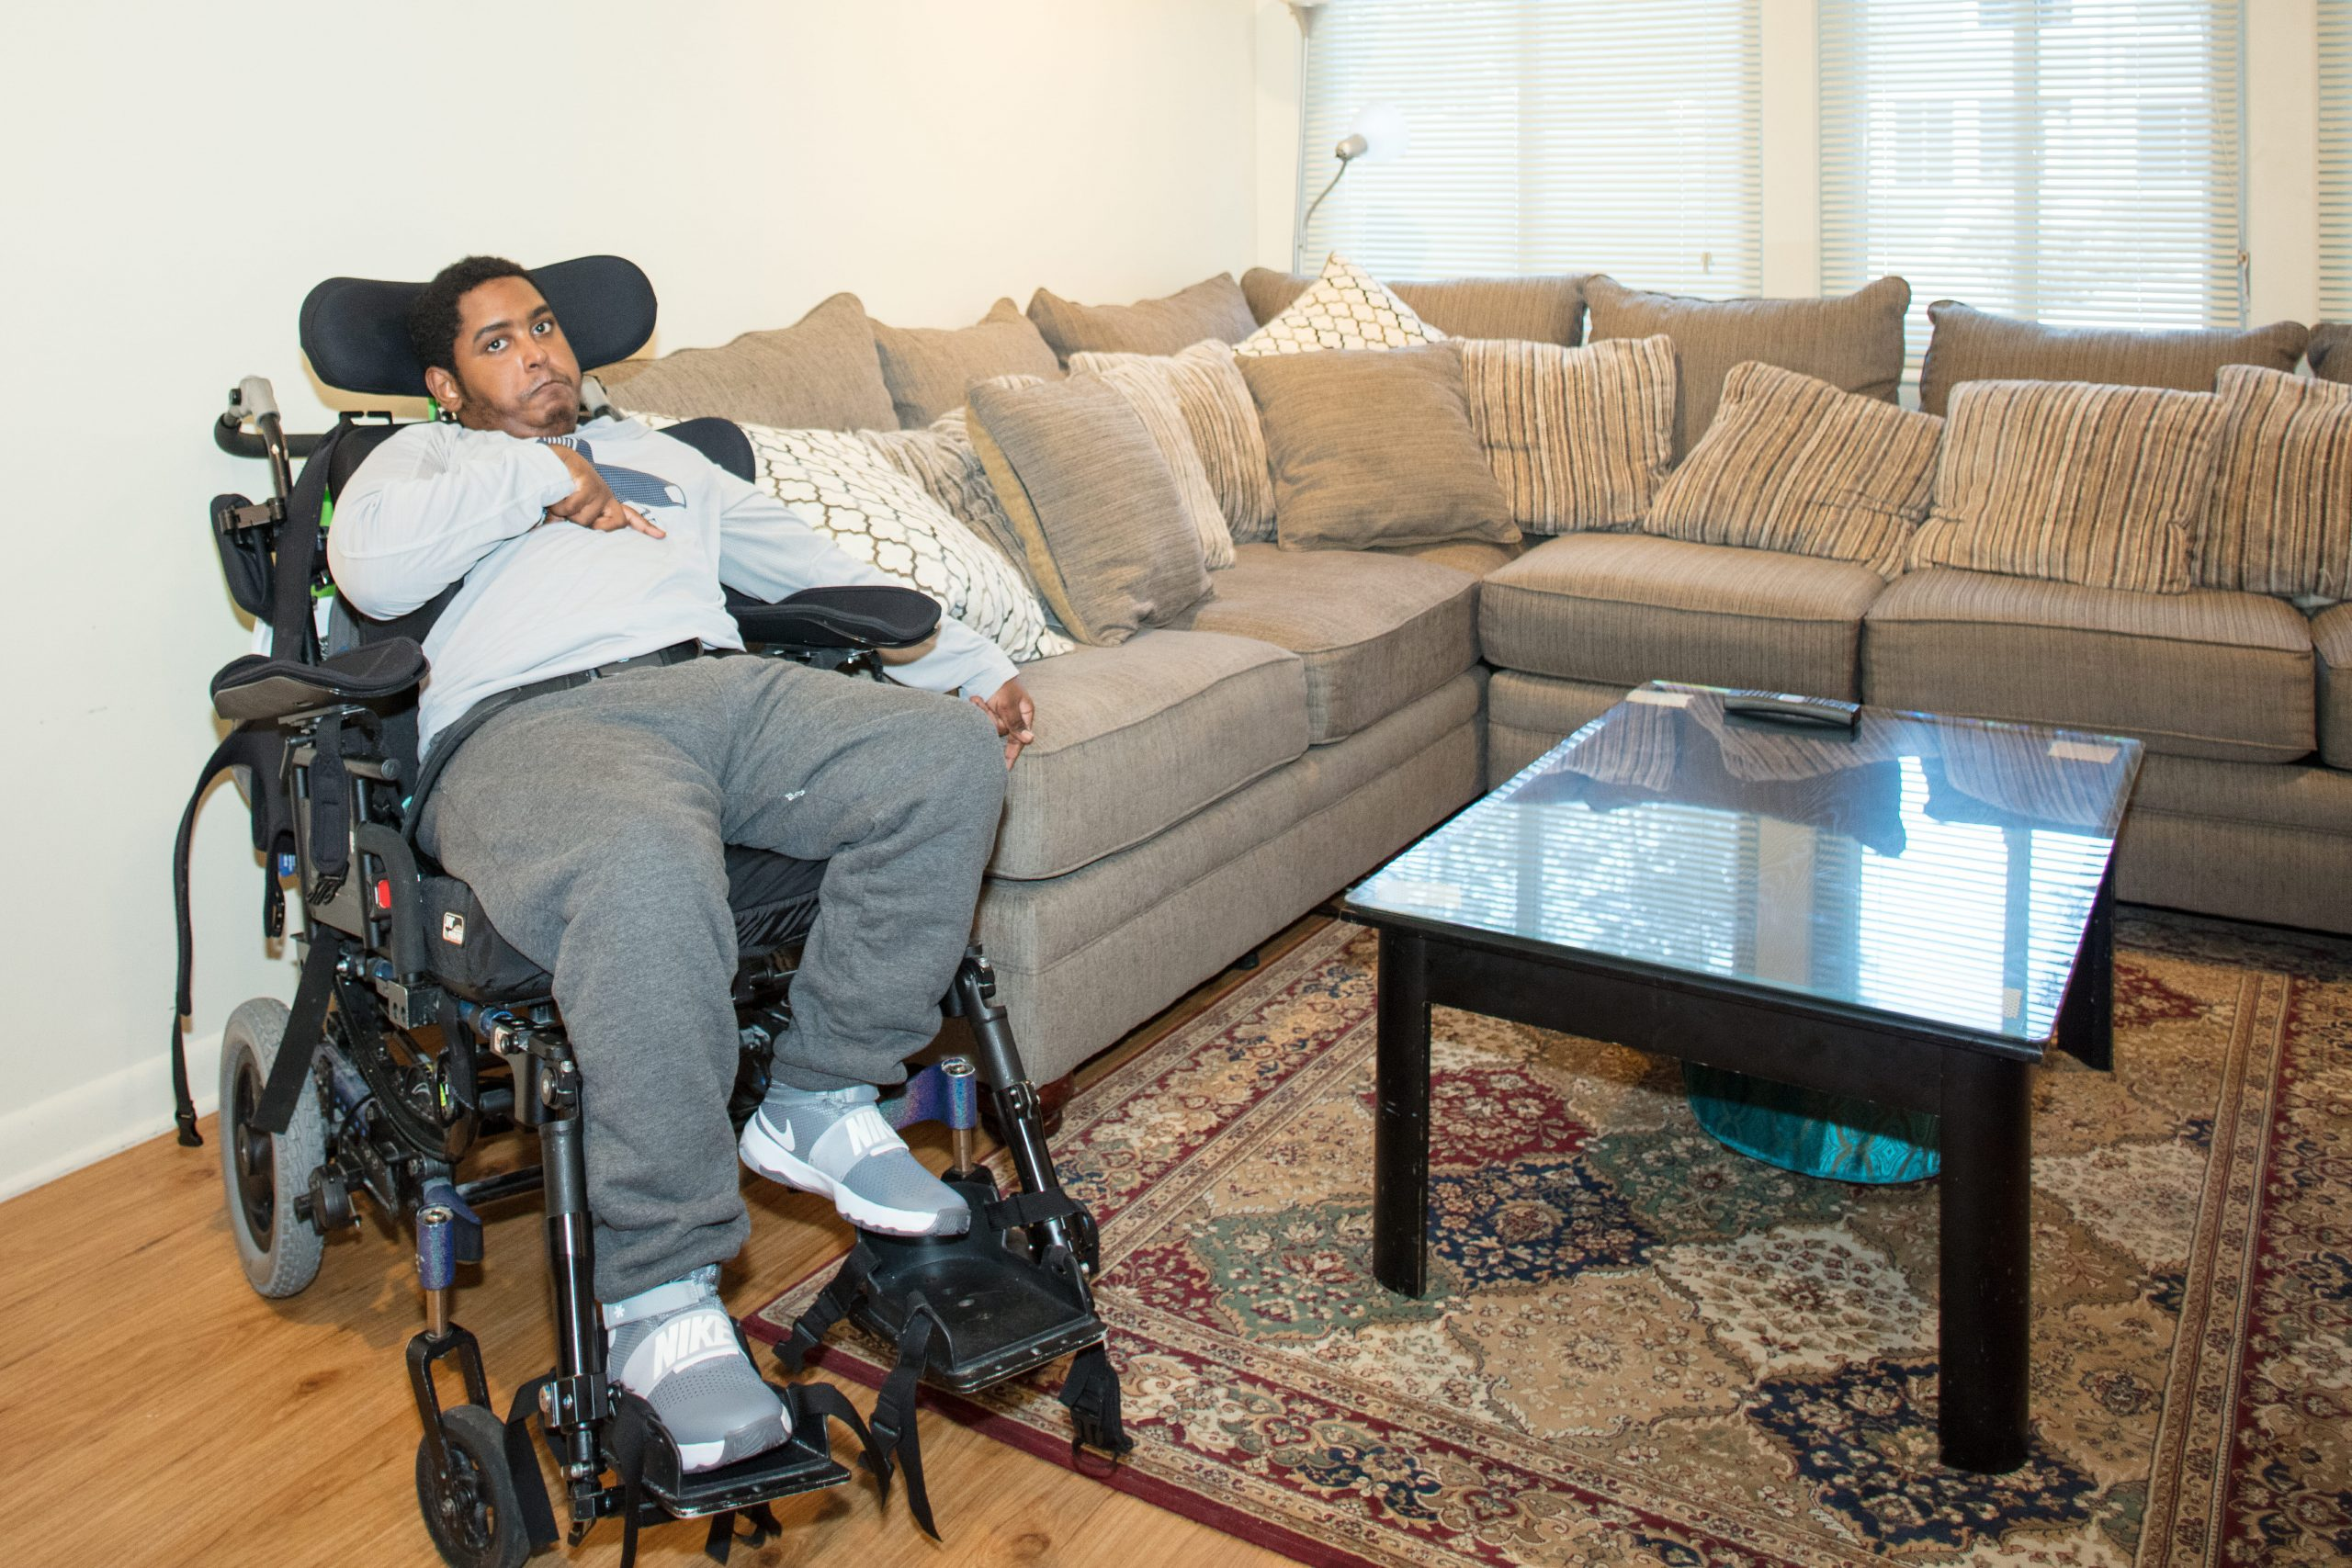 Abbi reclining in his chair